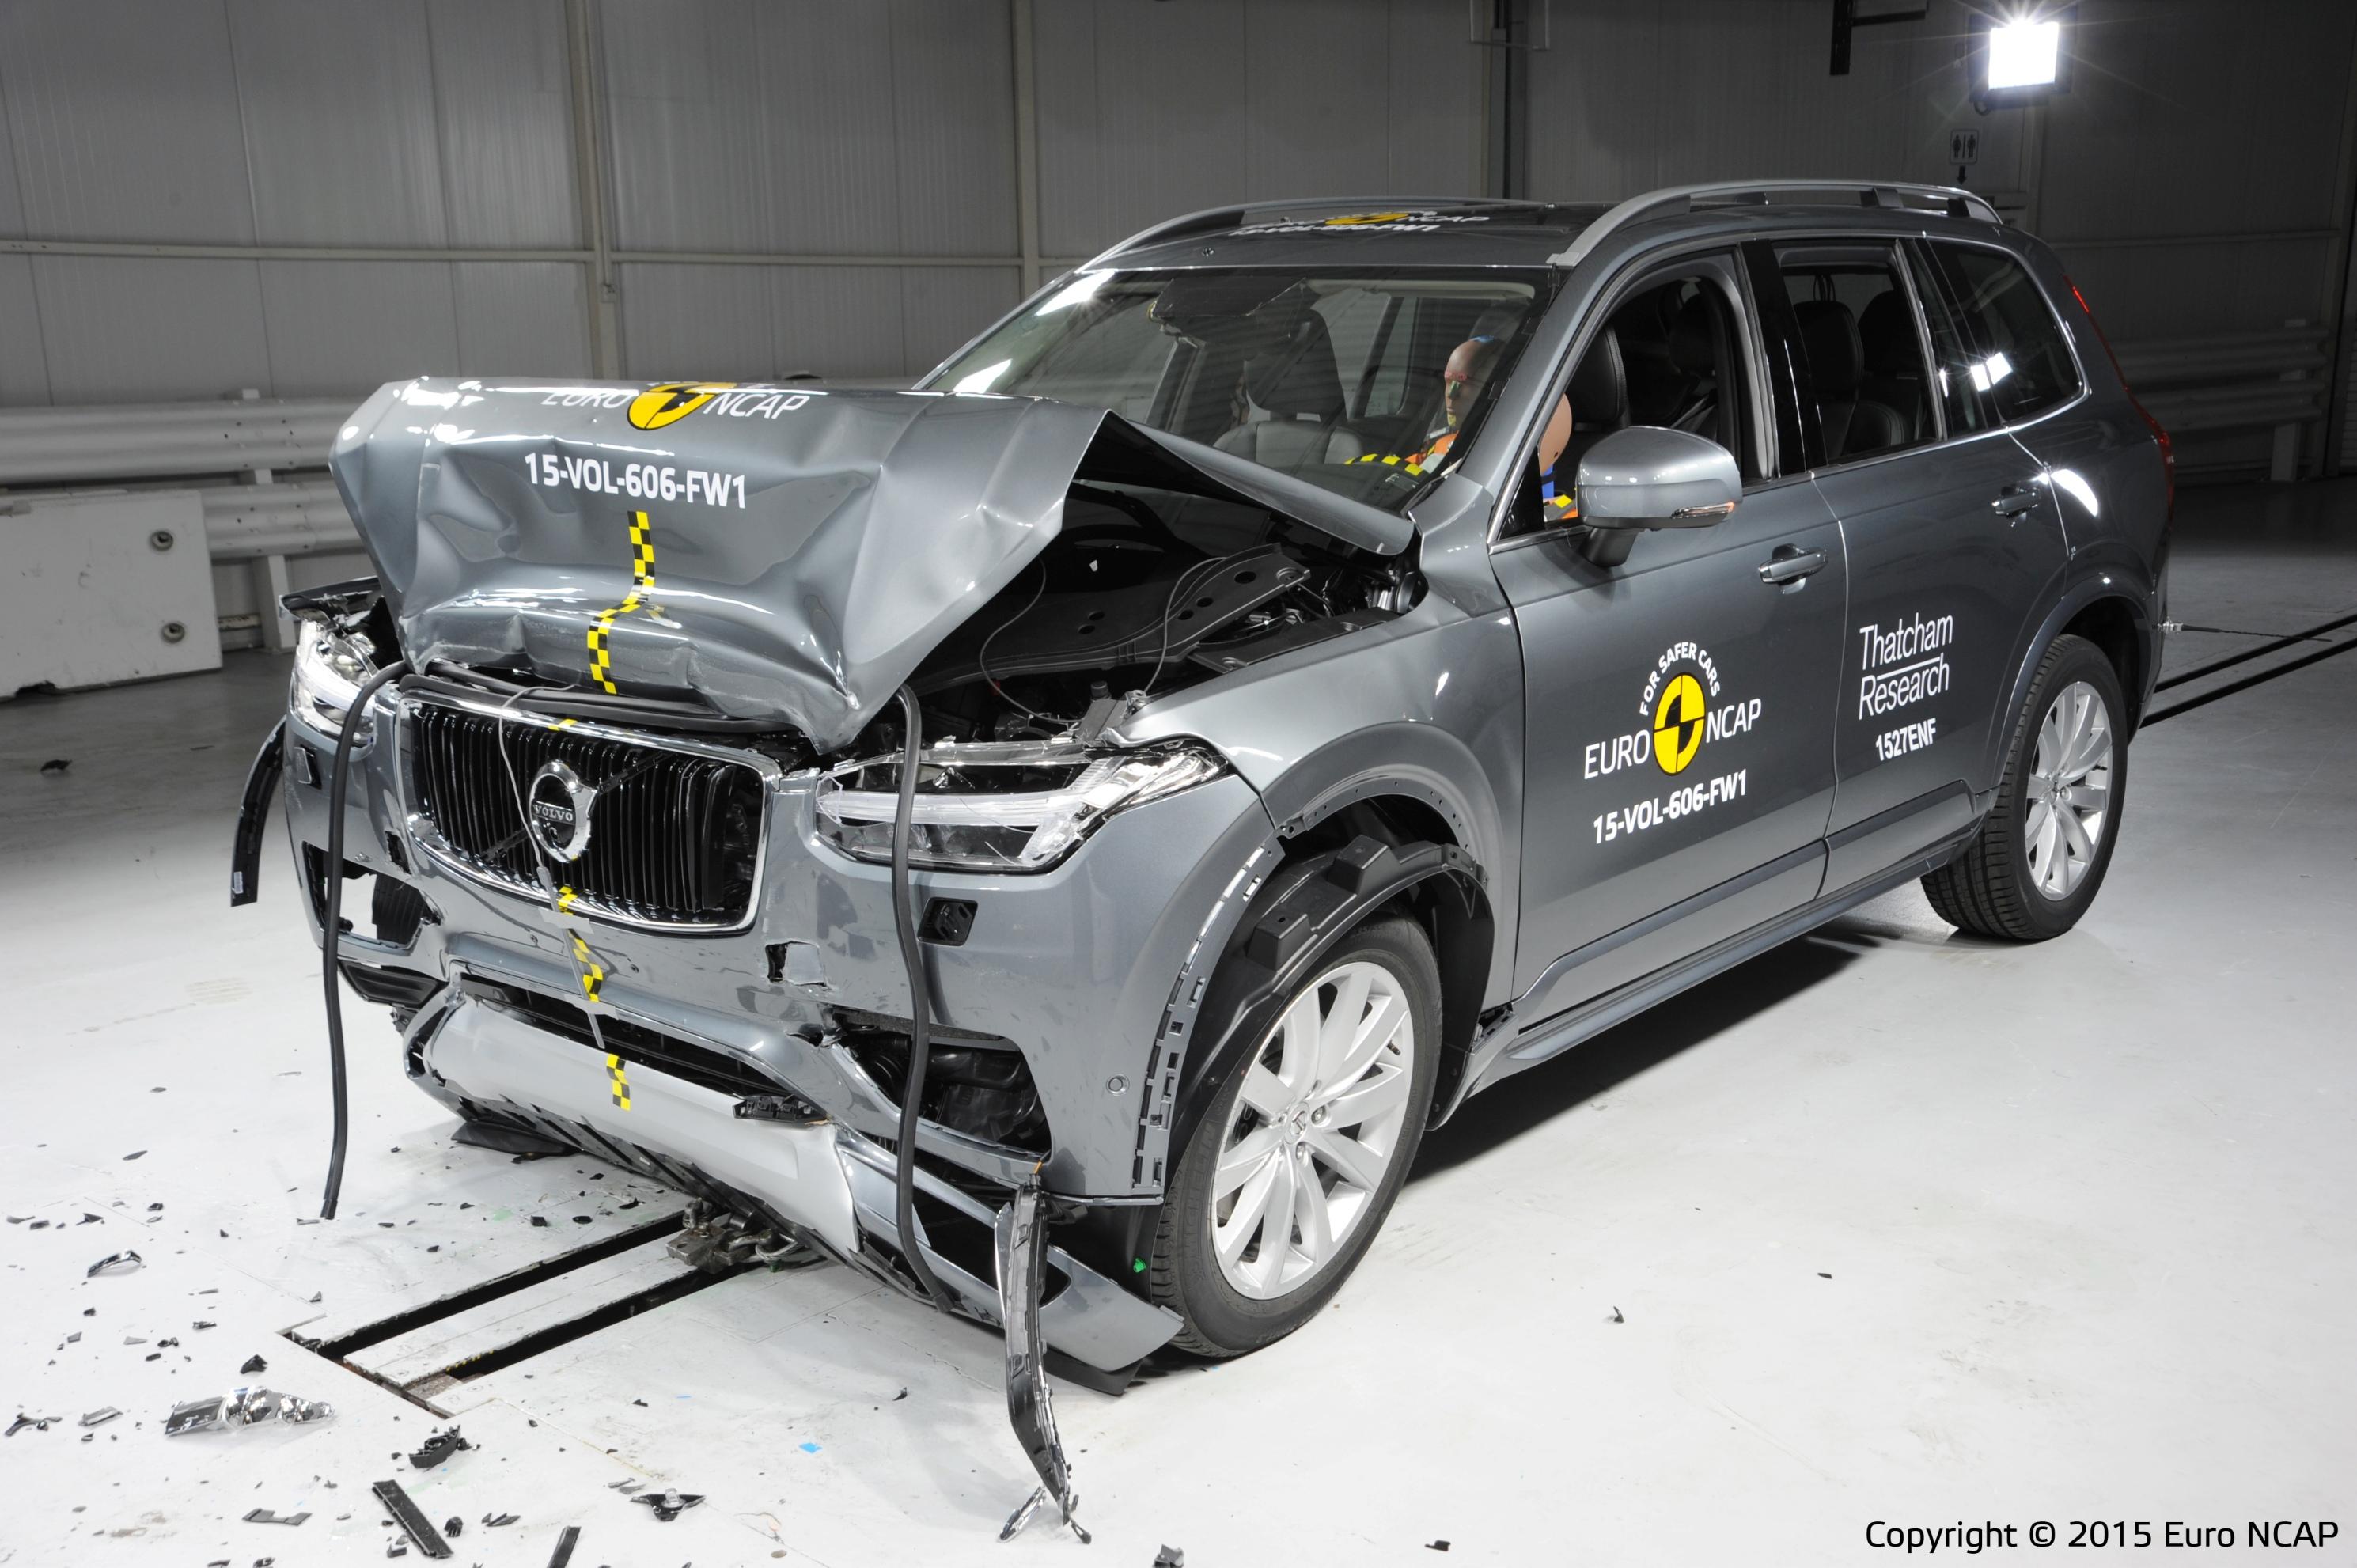 Frontal full width crash test of Volvo XC90